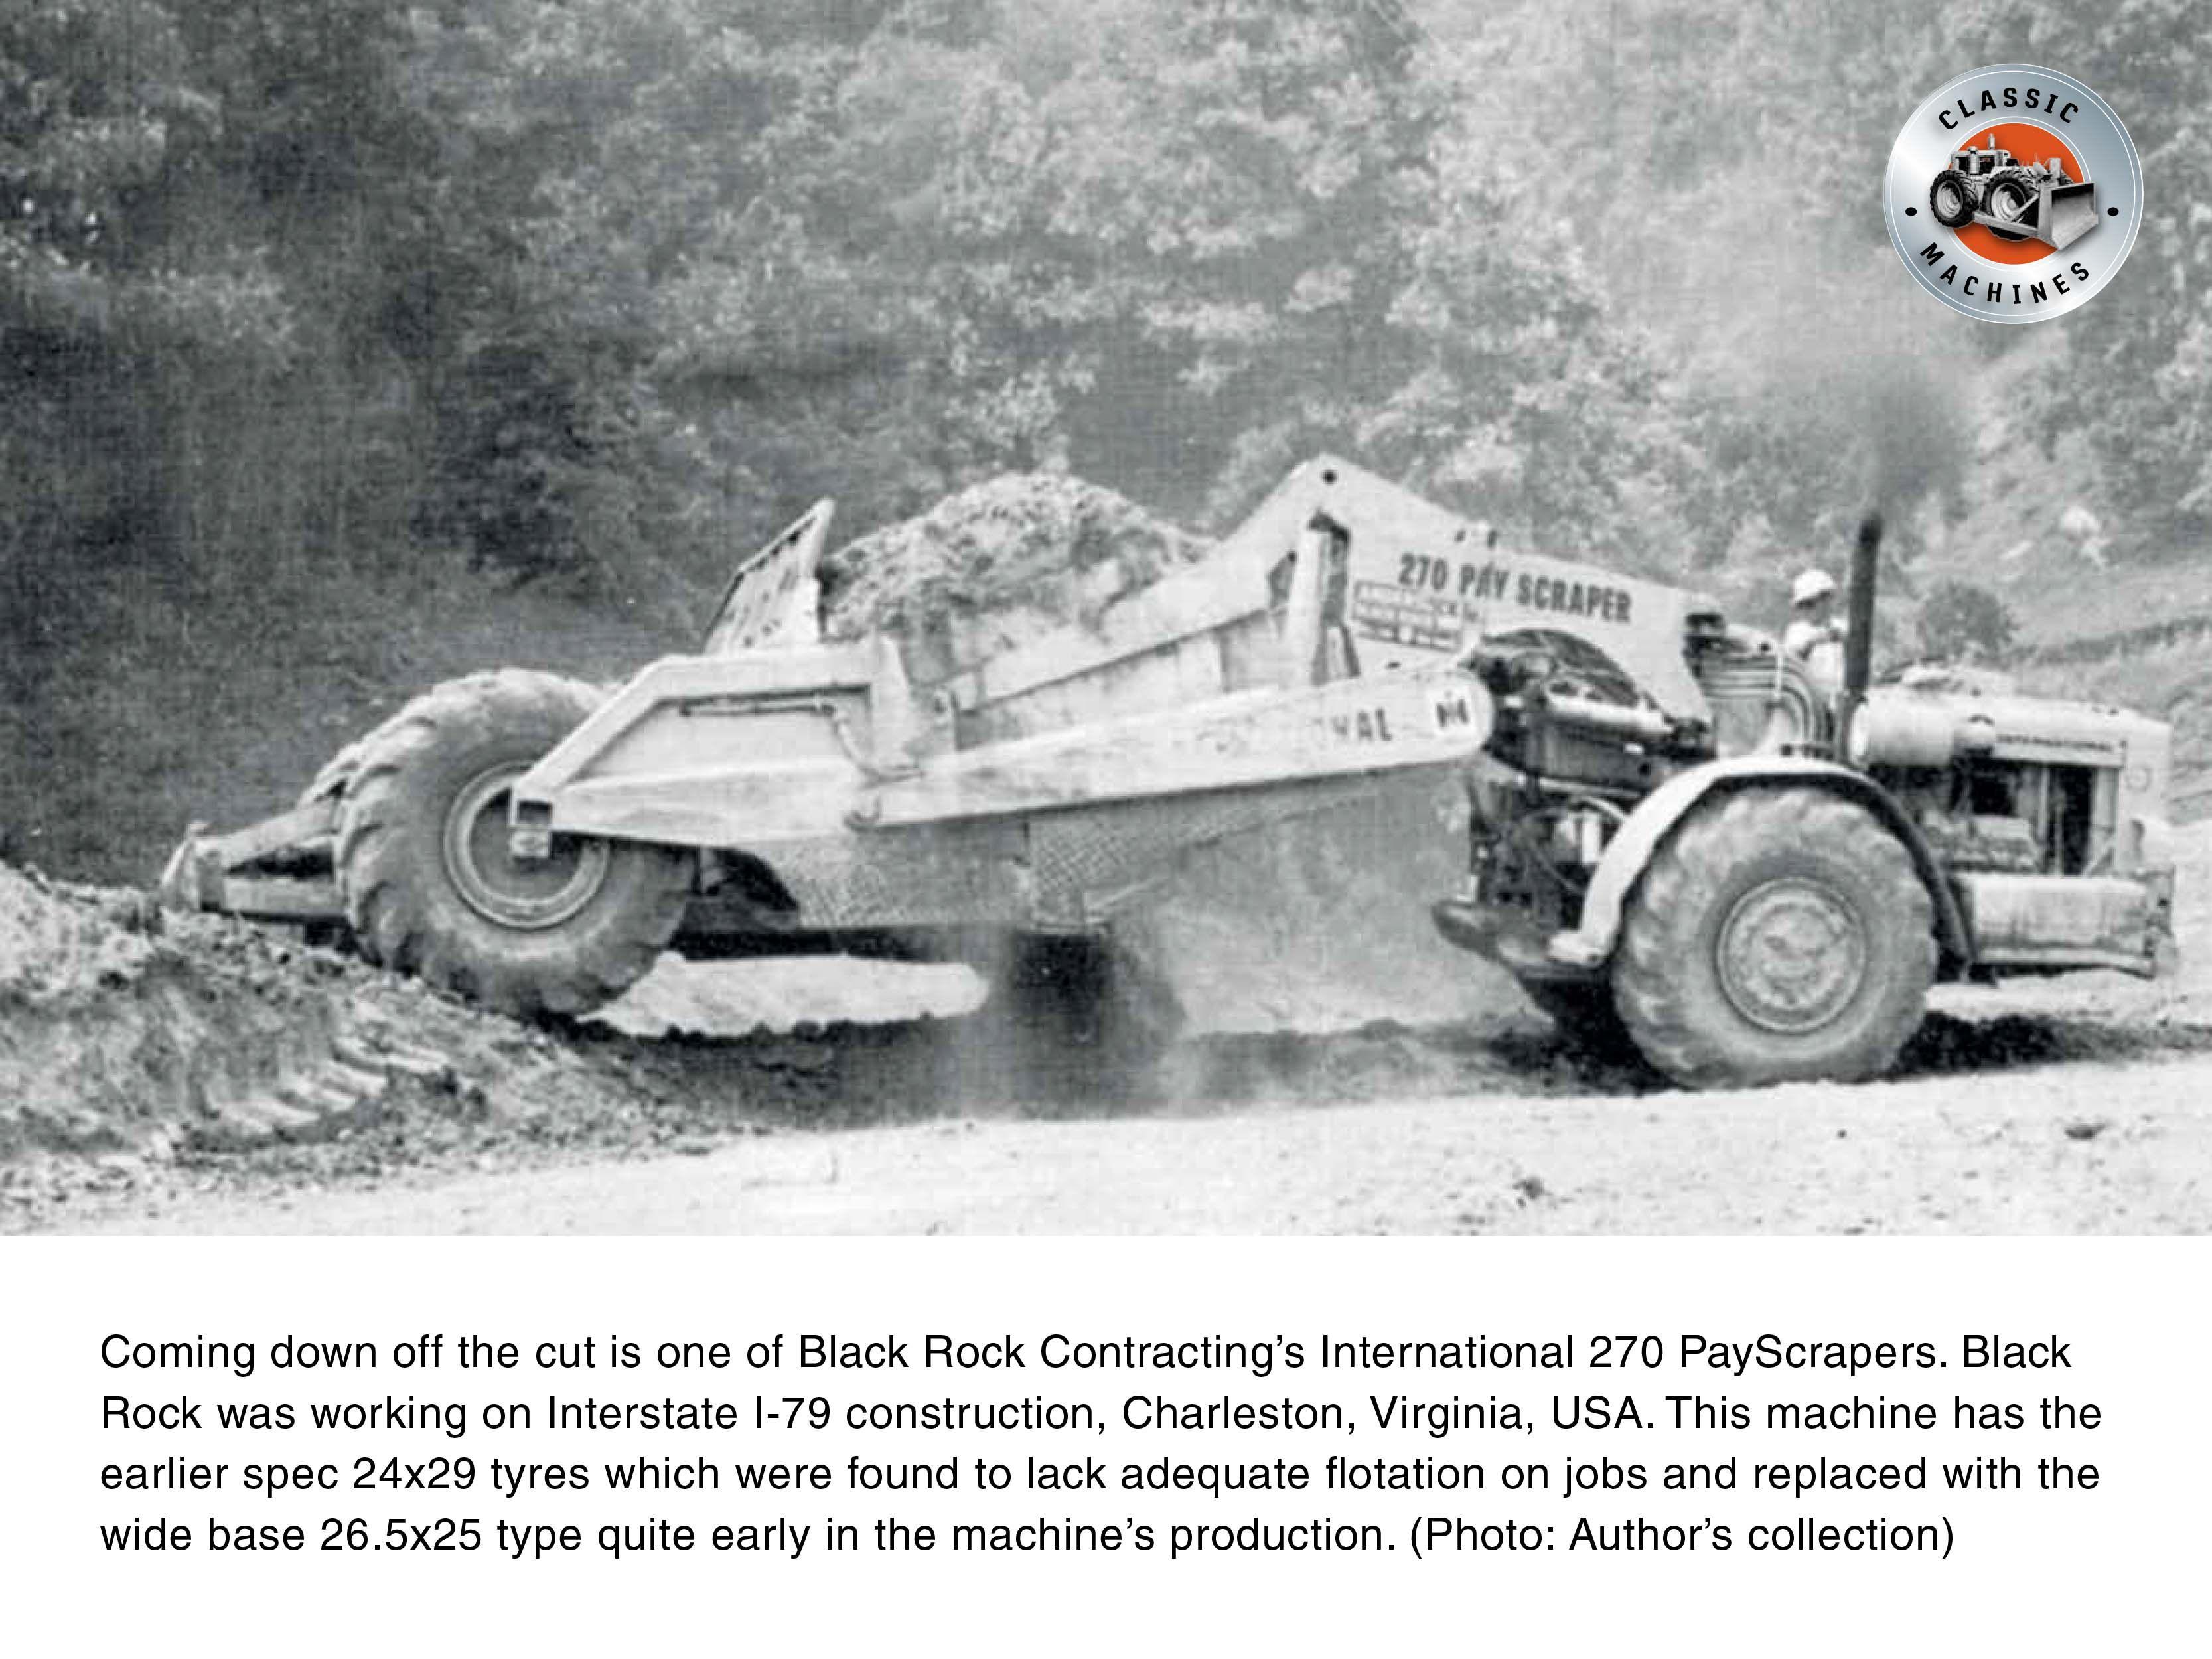 Black Rock Contractings International 270 PayScraper